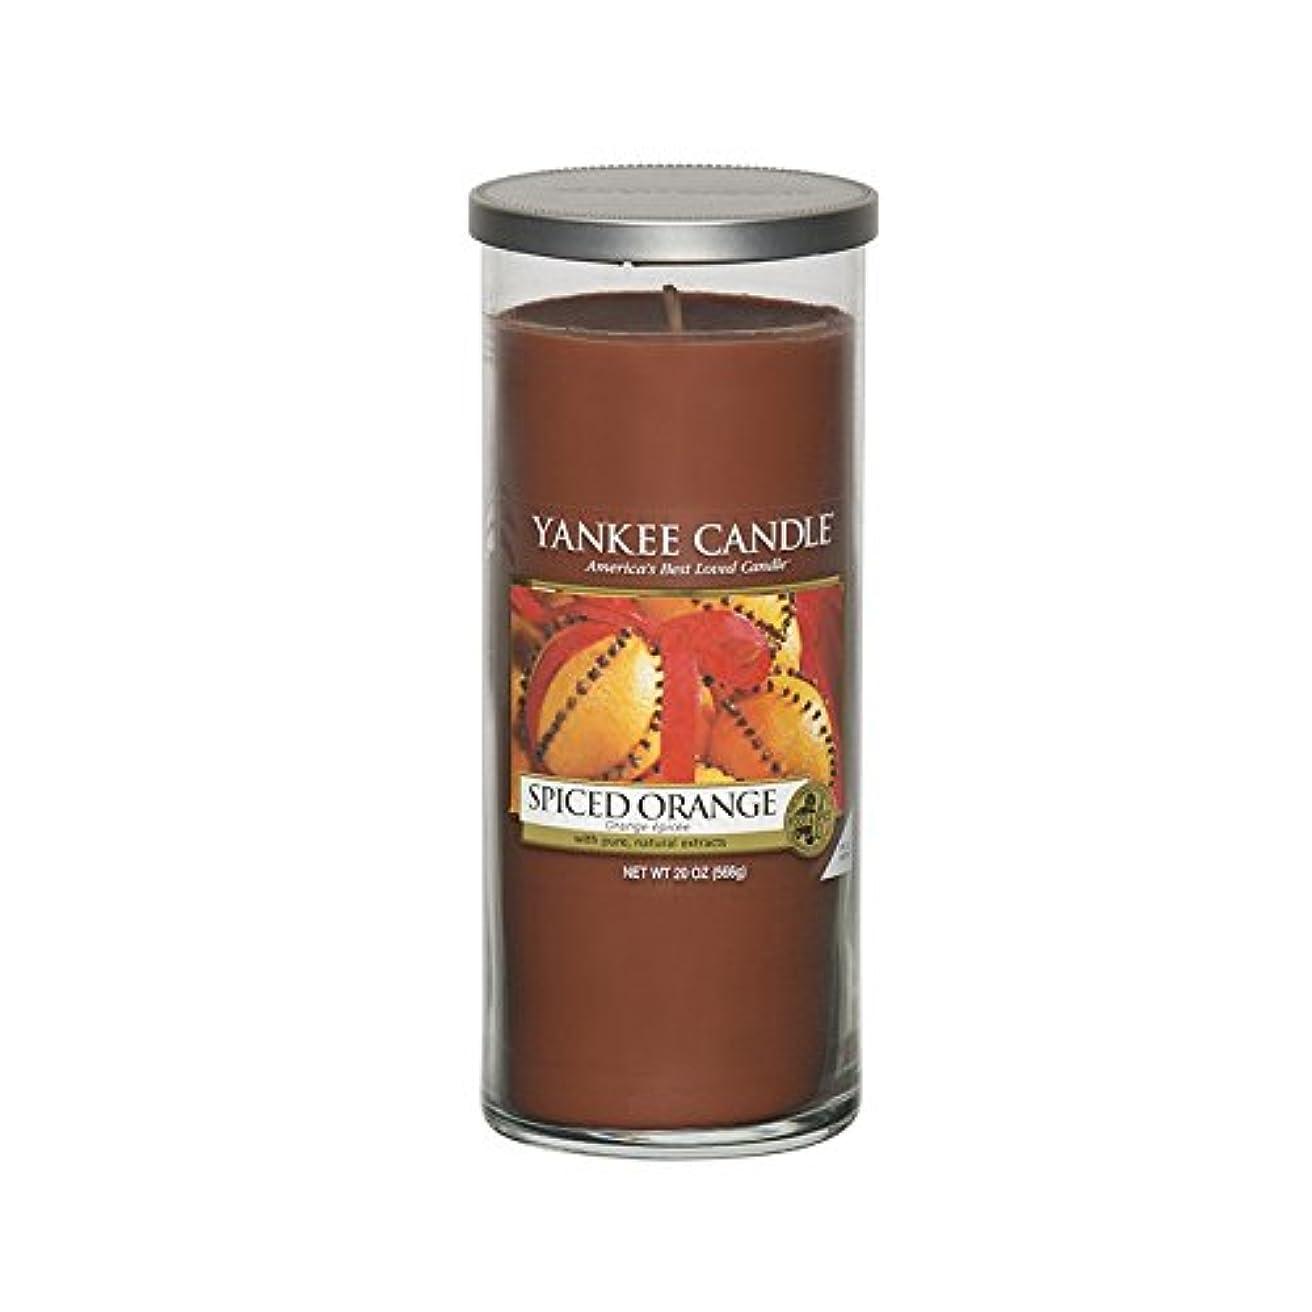 Yankee Candles Large Pillar Candle - Spiced Orange (Pack of 2) - ヤンキーキャンドル大きな柱キャンドル - スパイスオレンジ (x2) [並行輸入品]